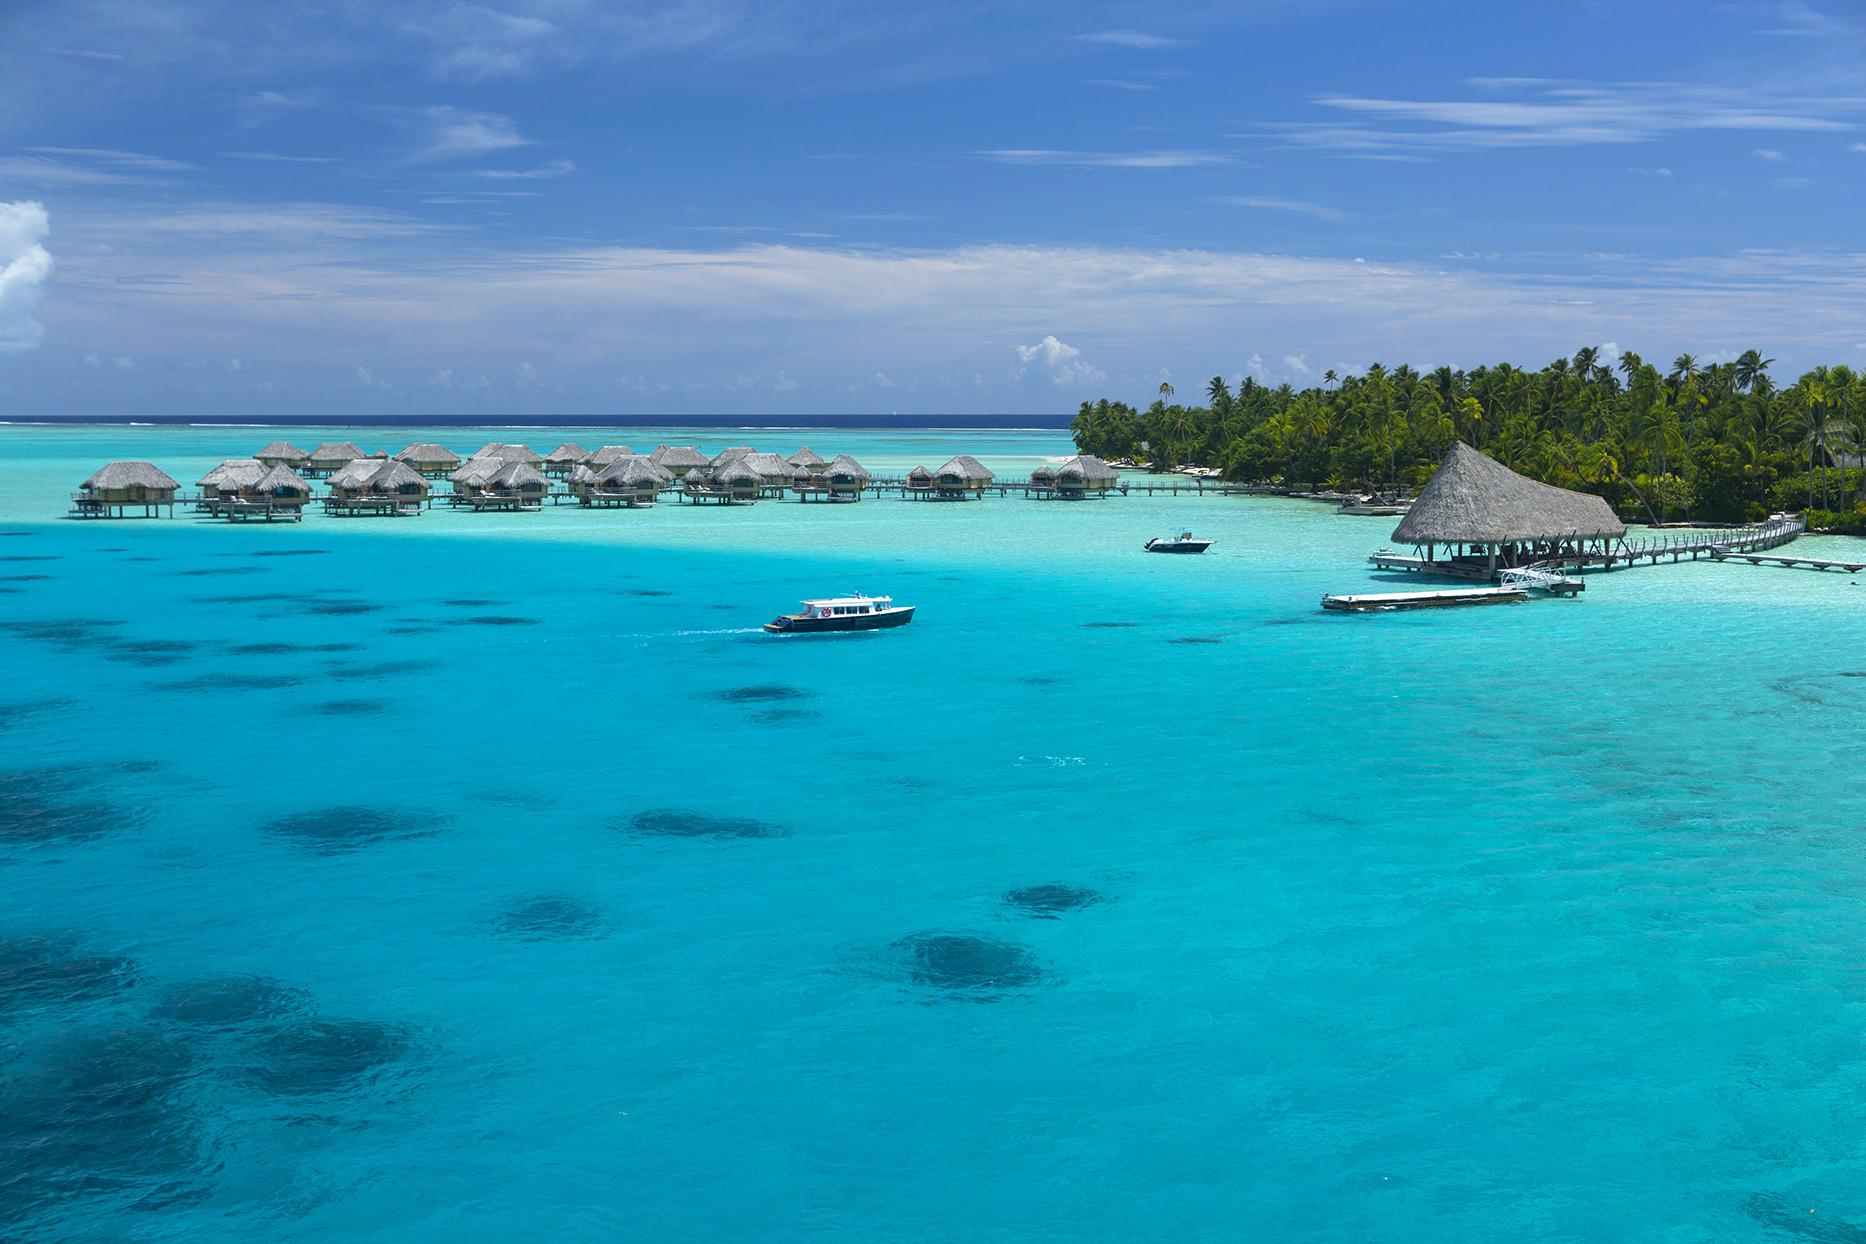 lagoons and lush trees on taha'a island